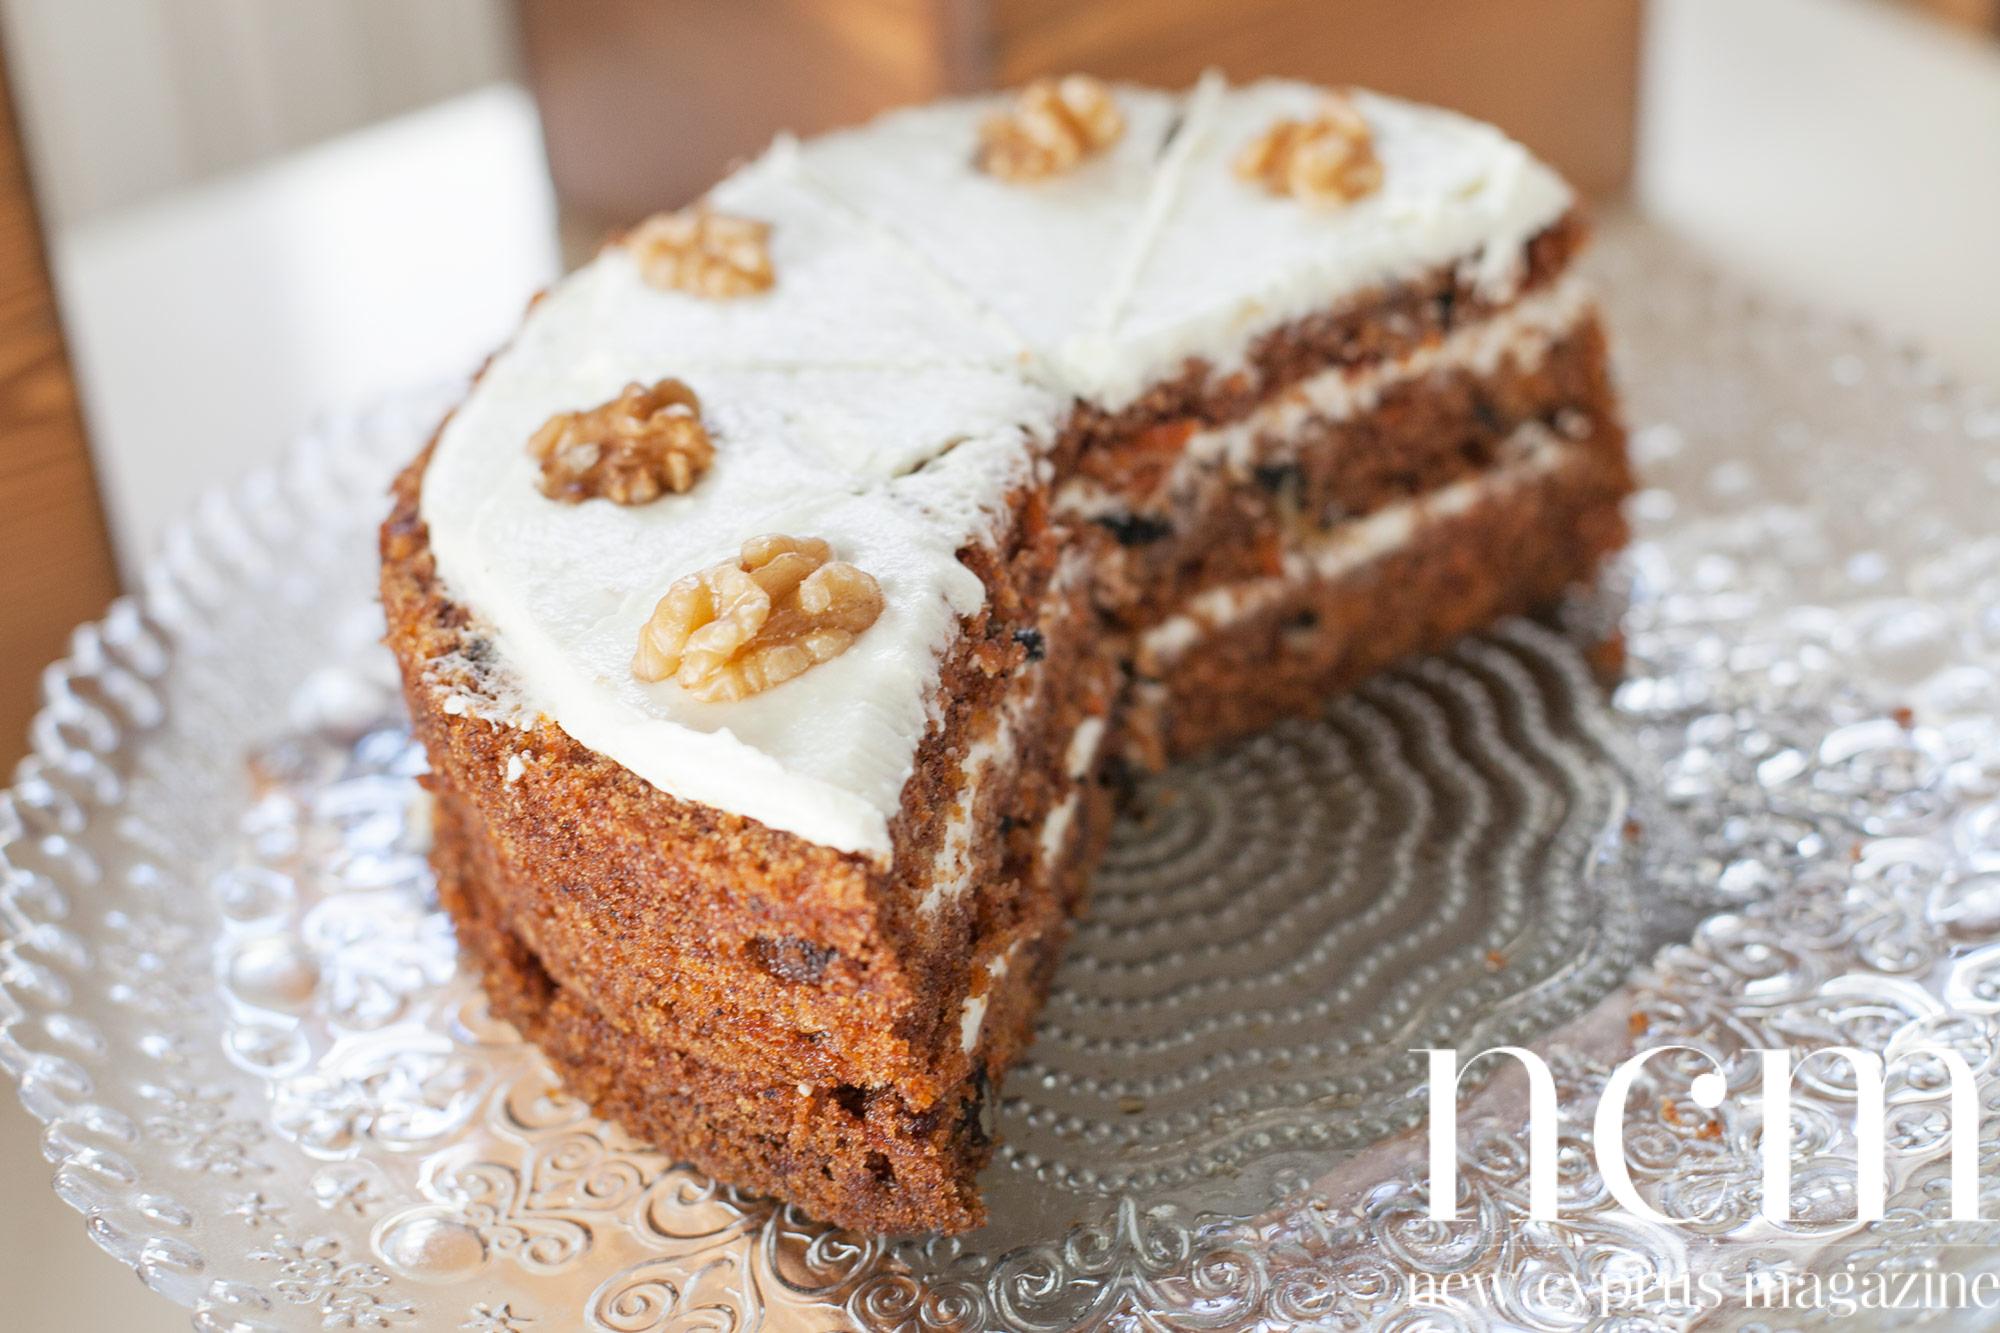 Café Oregano Bellapais, carrot cake